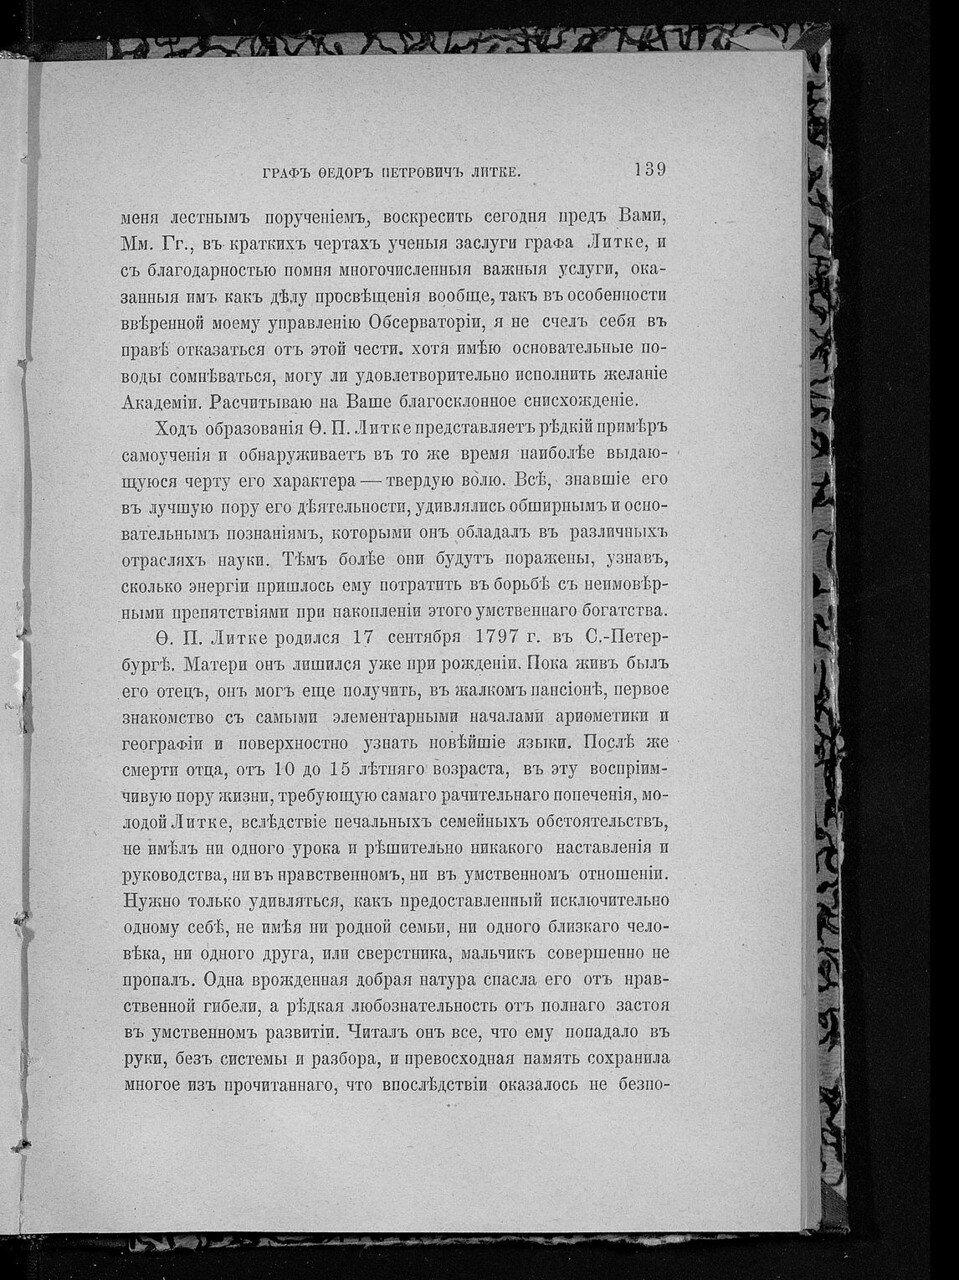 https://img-fotki.yandex.ru/get/876523/199368979.d6/0_21de29_c43a9521_XXXL.jpg